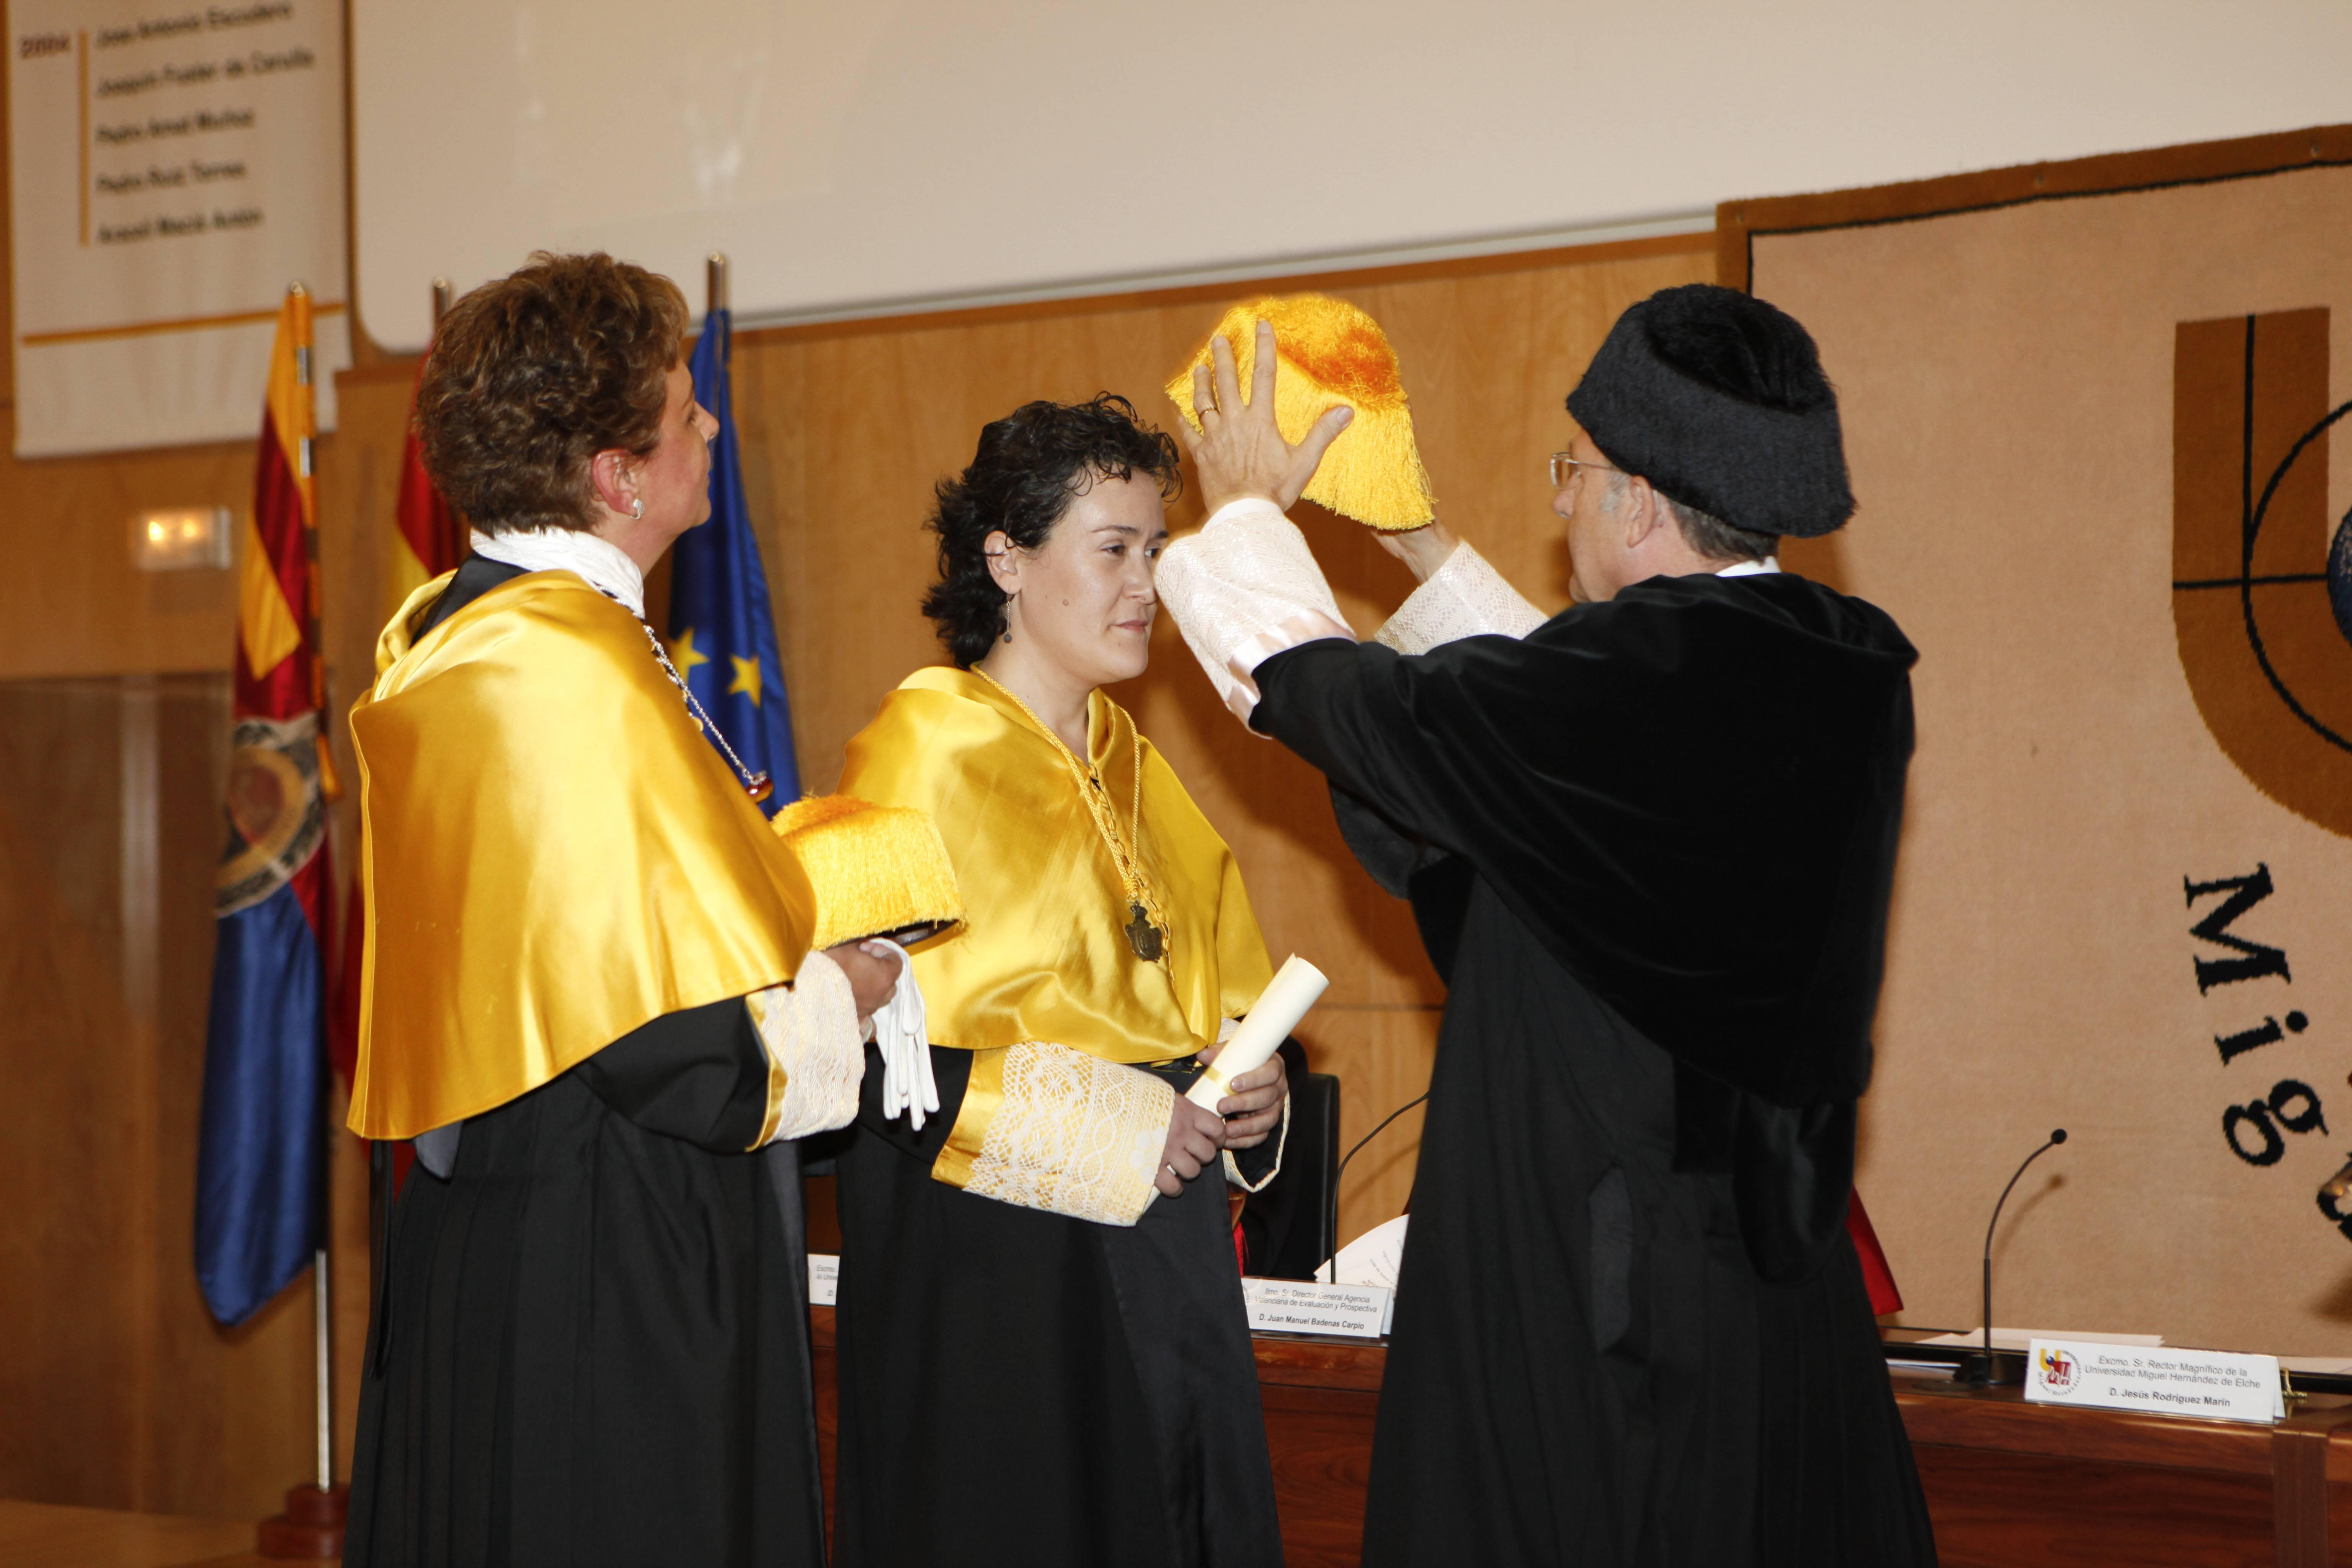 doctor-honoris-causa-luis-gamir_mg_1133.jpg